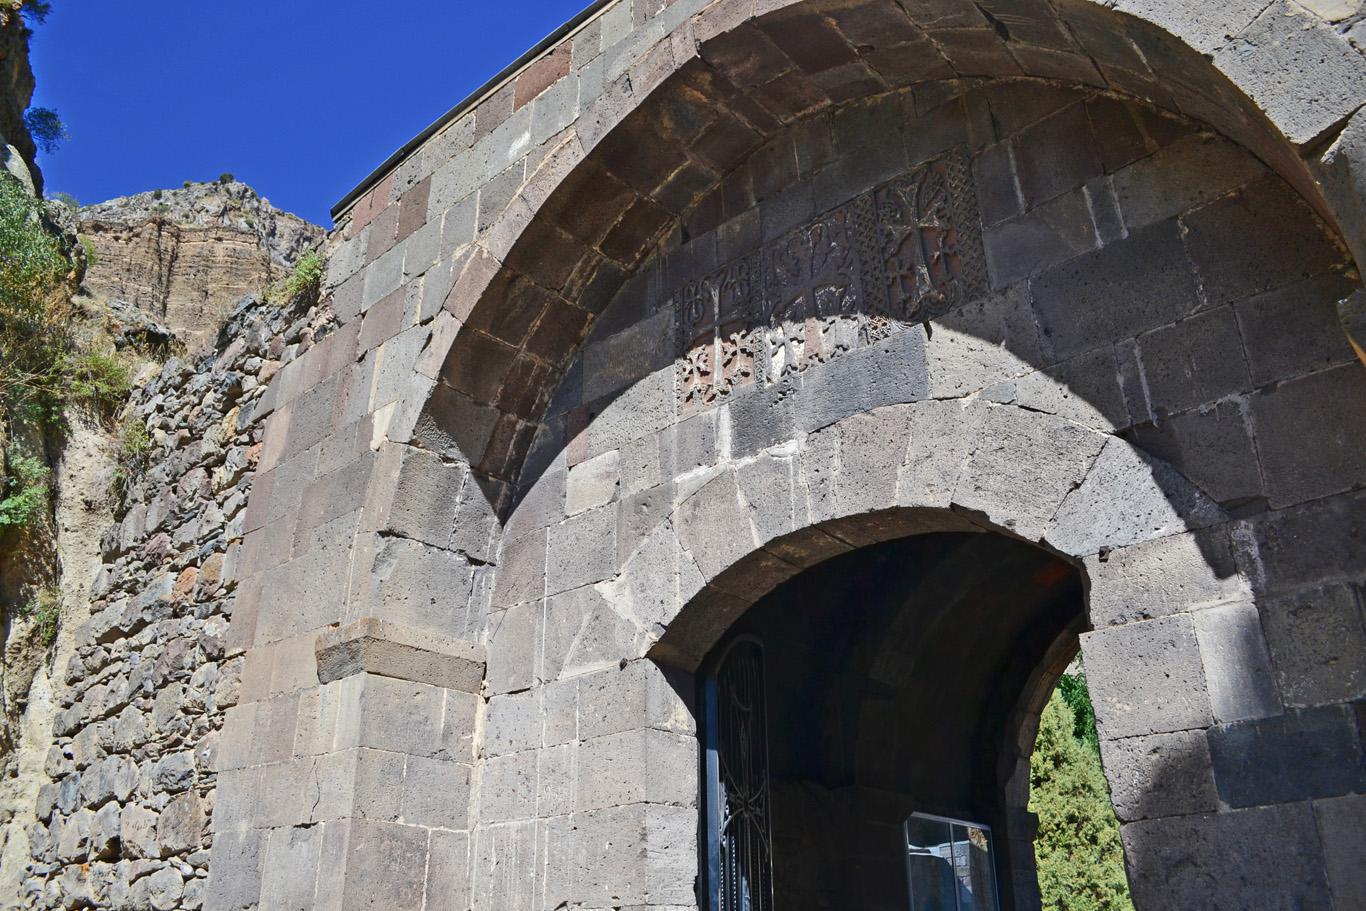 Gate to the Geghard Monastery